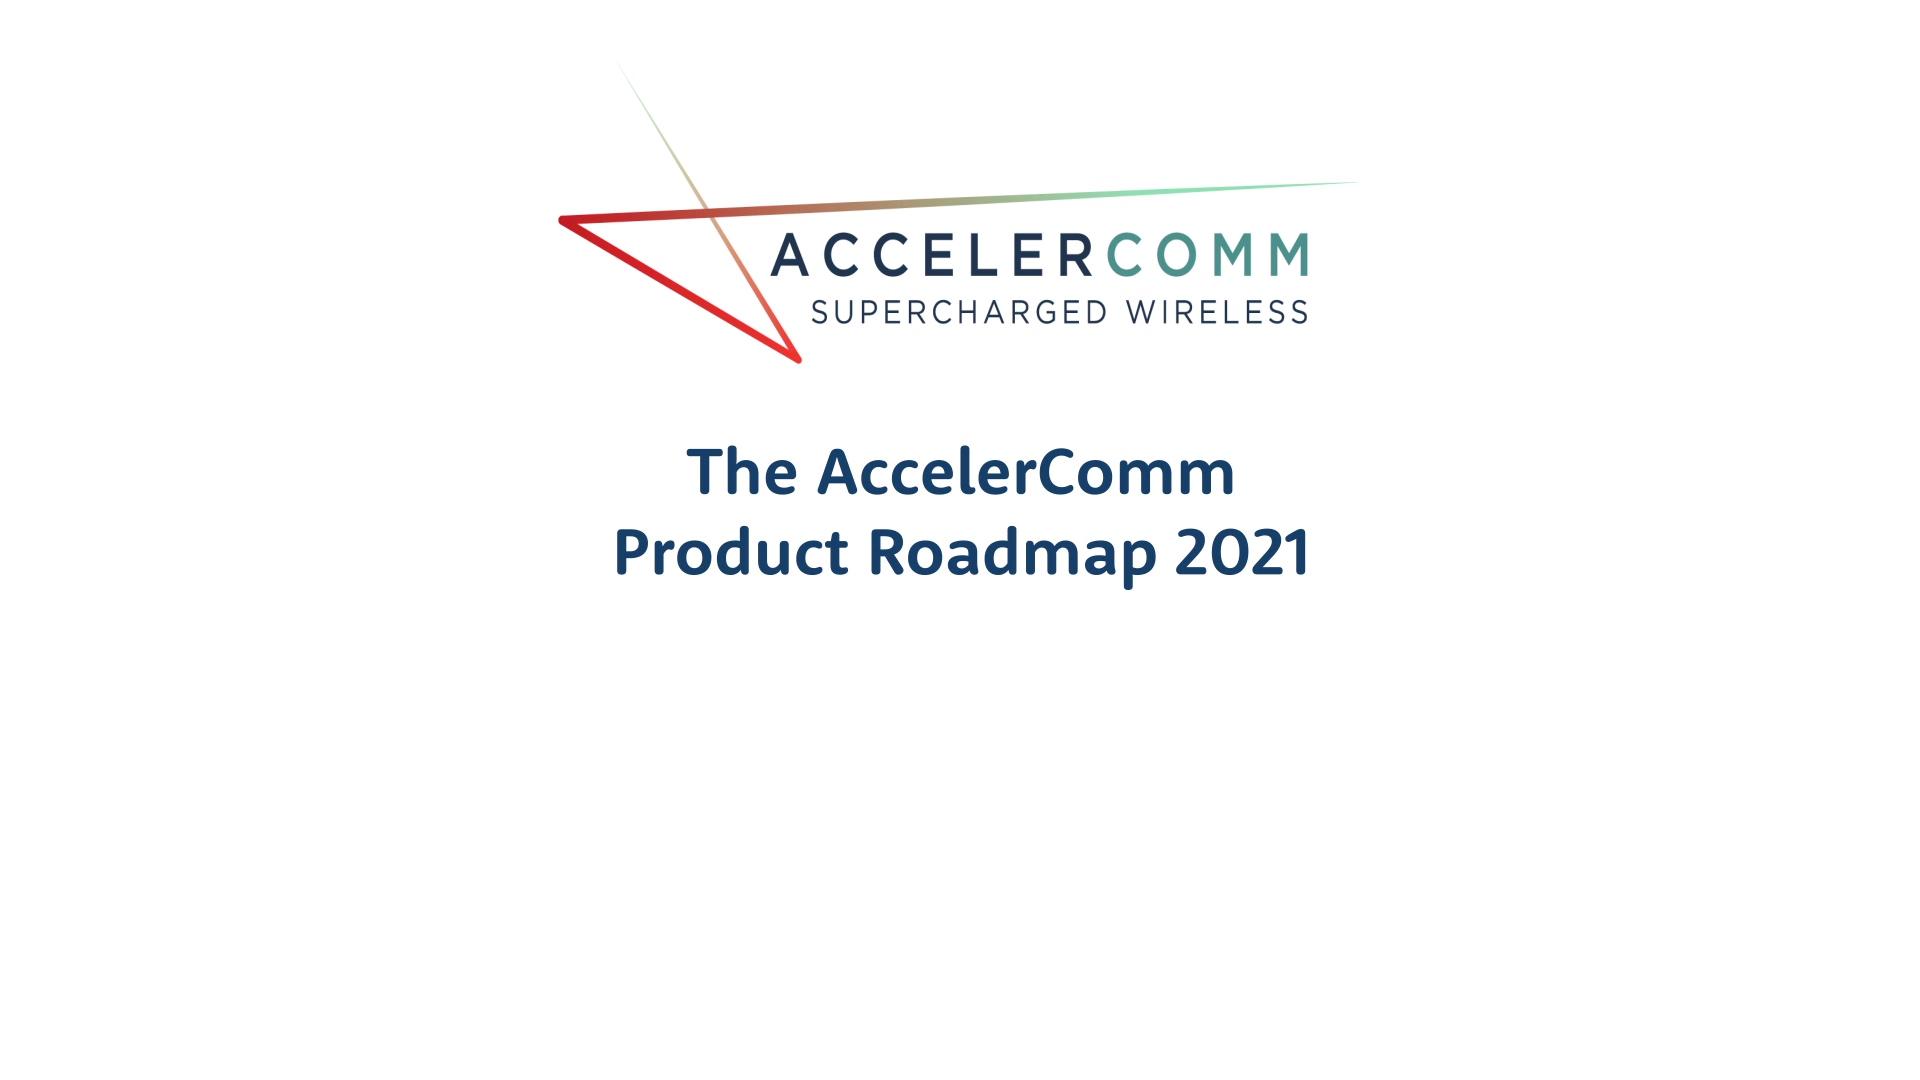 The_AccelerComm_Product_Roadmap_2021